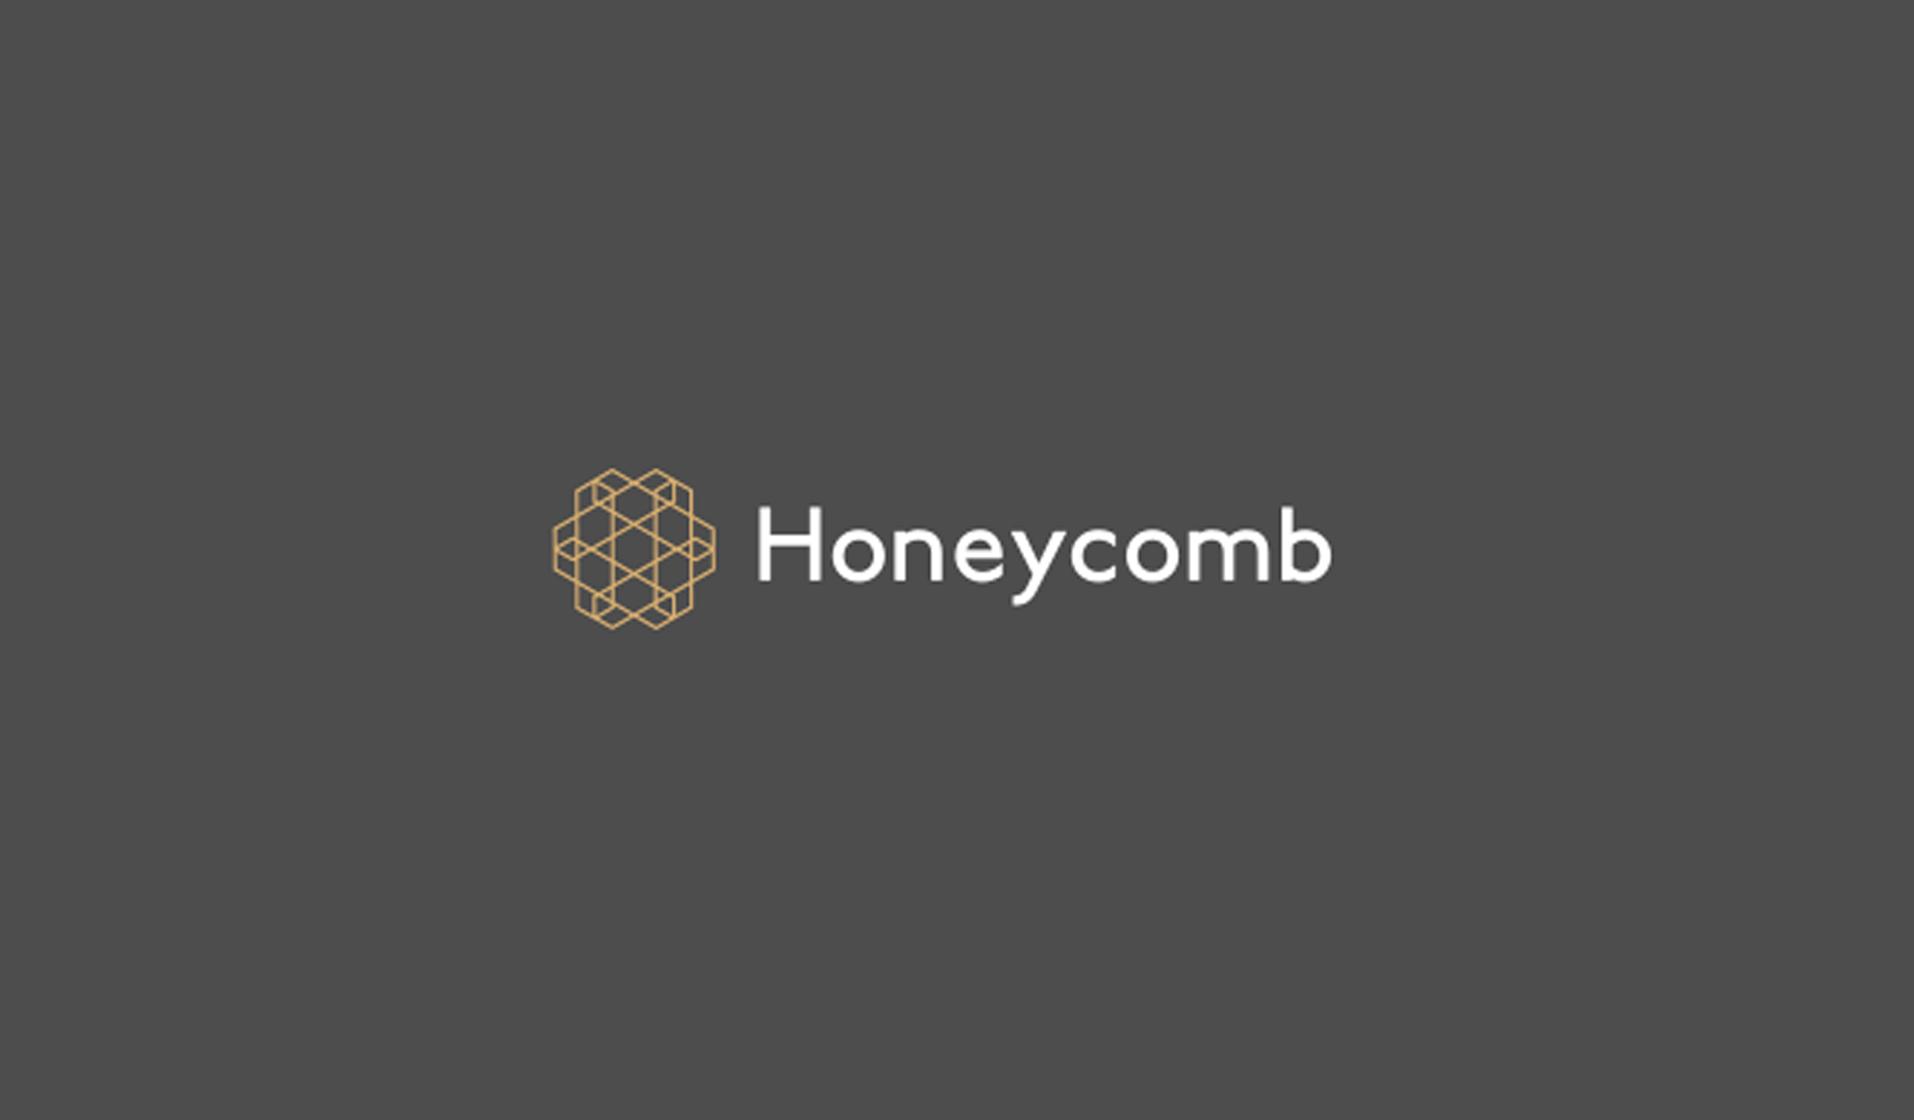 Announcement: Honeycomb & CashFlows